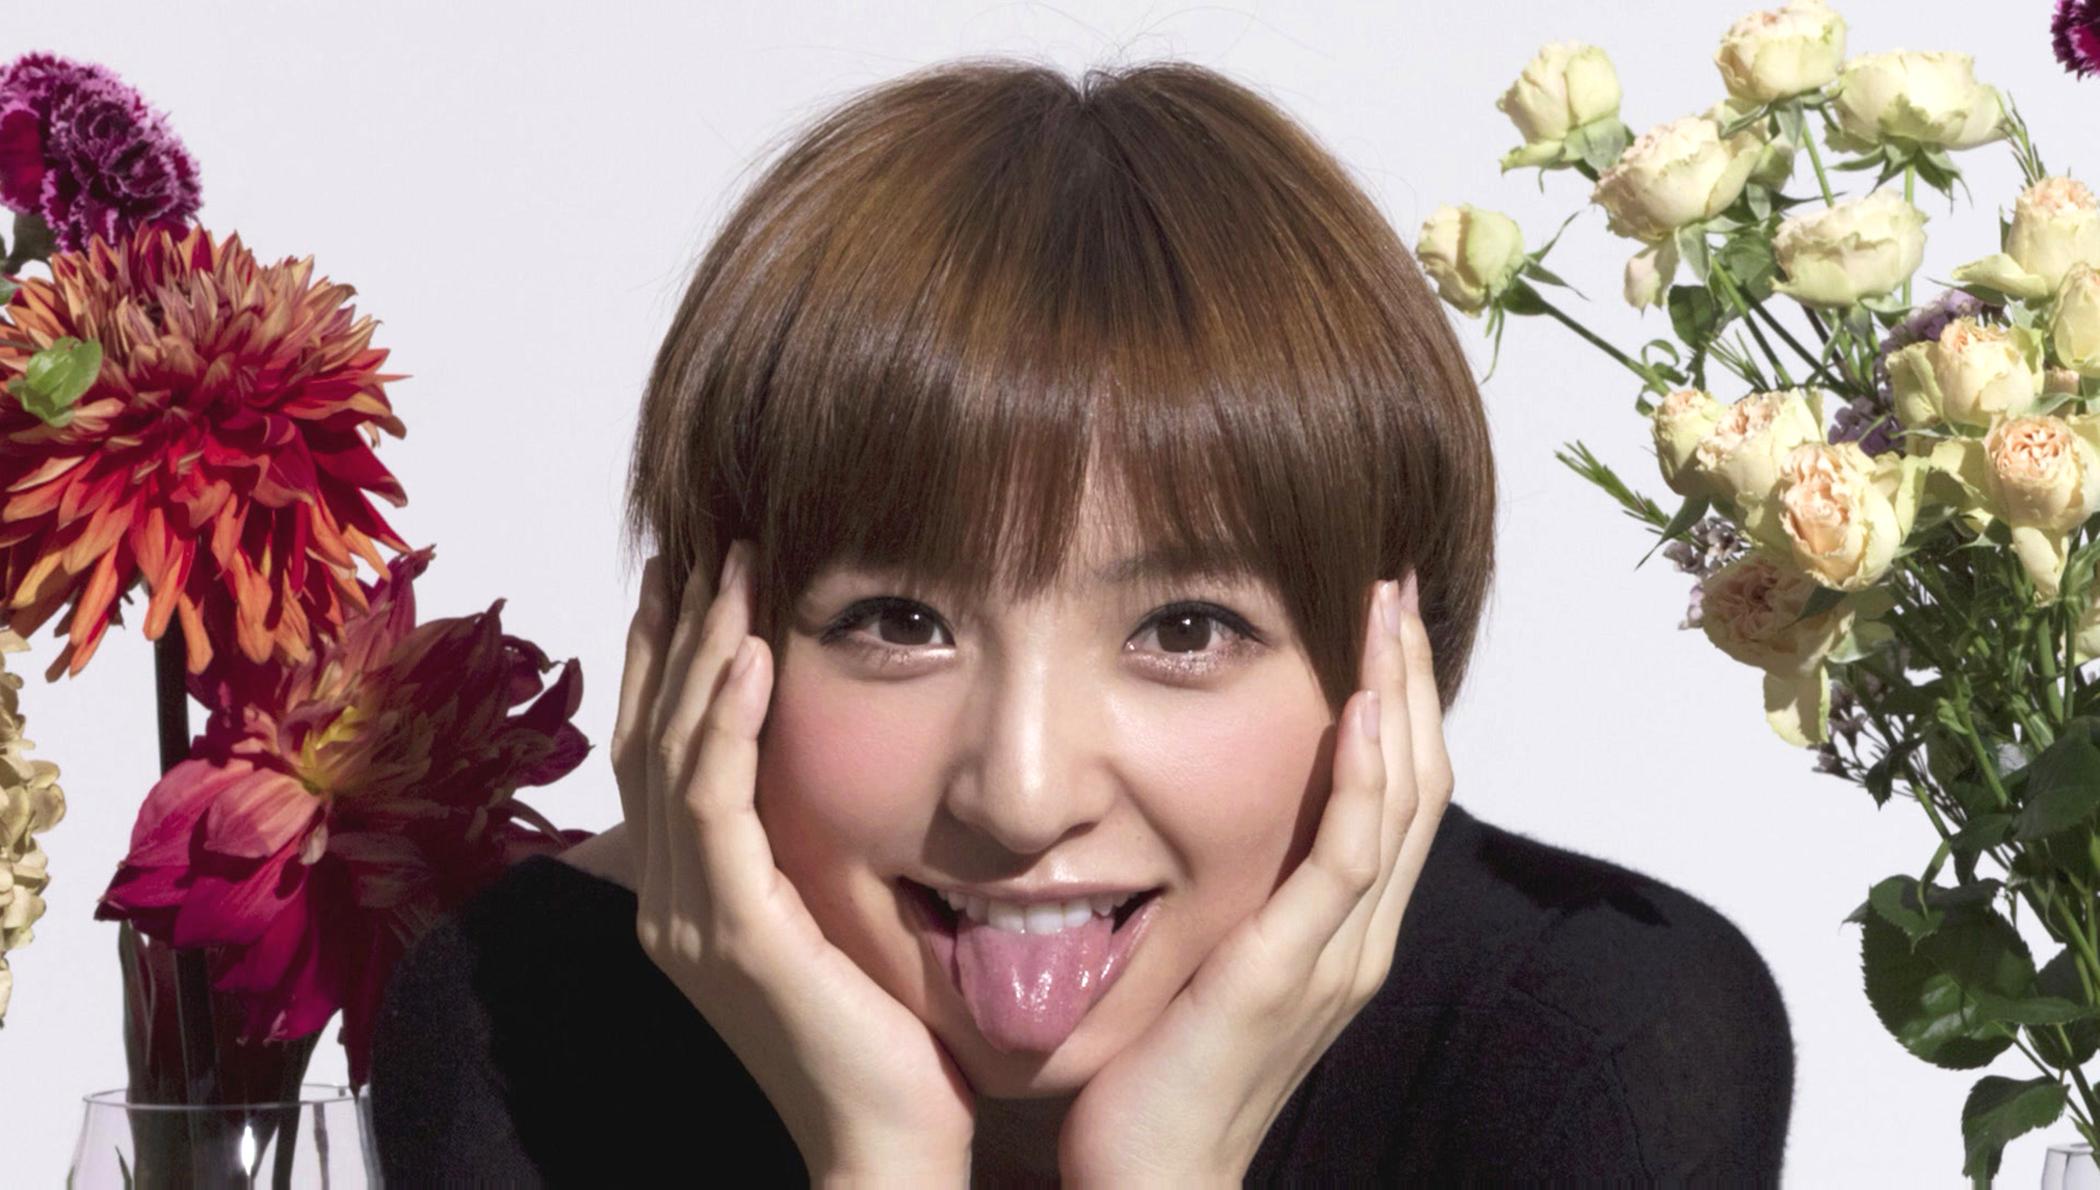 http://livedoor.4.blogimg.jp/adult_pics/imgs/c/a/ca590a9c.jpg